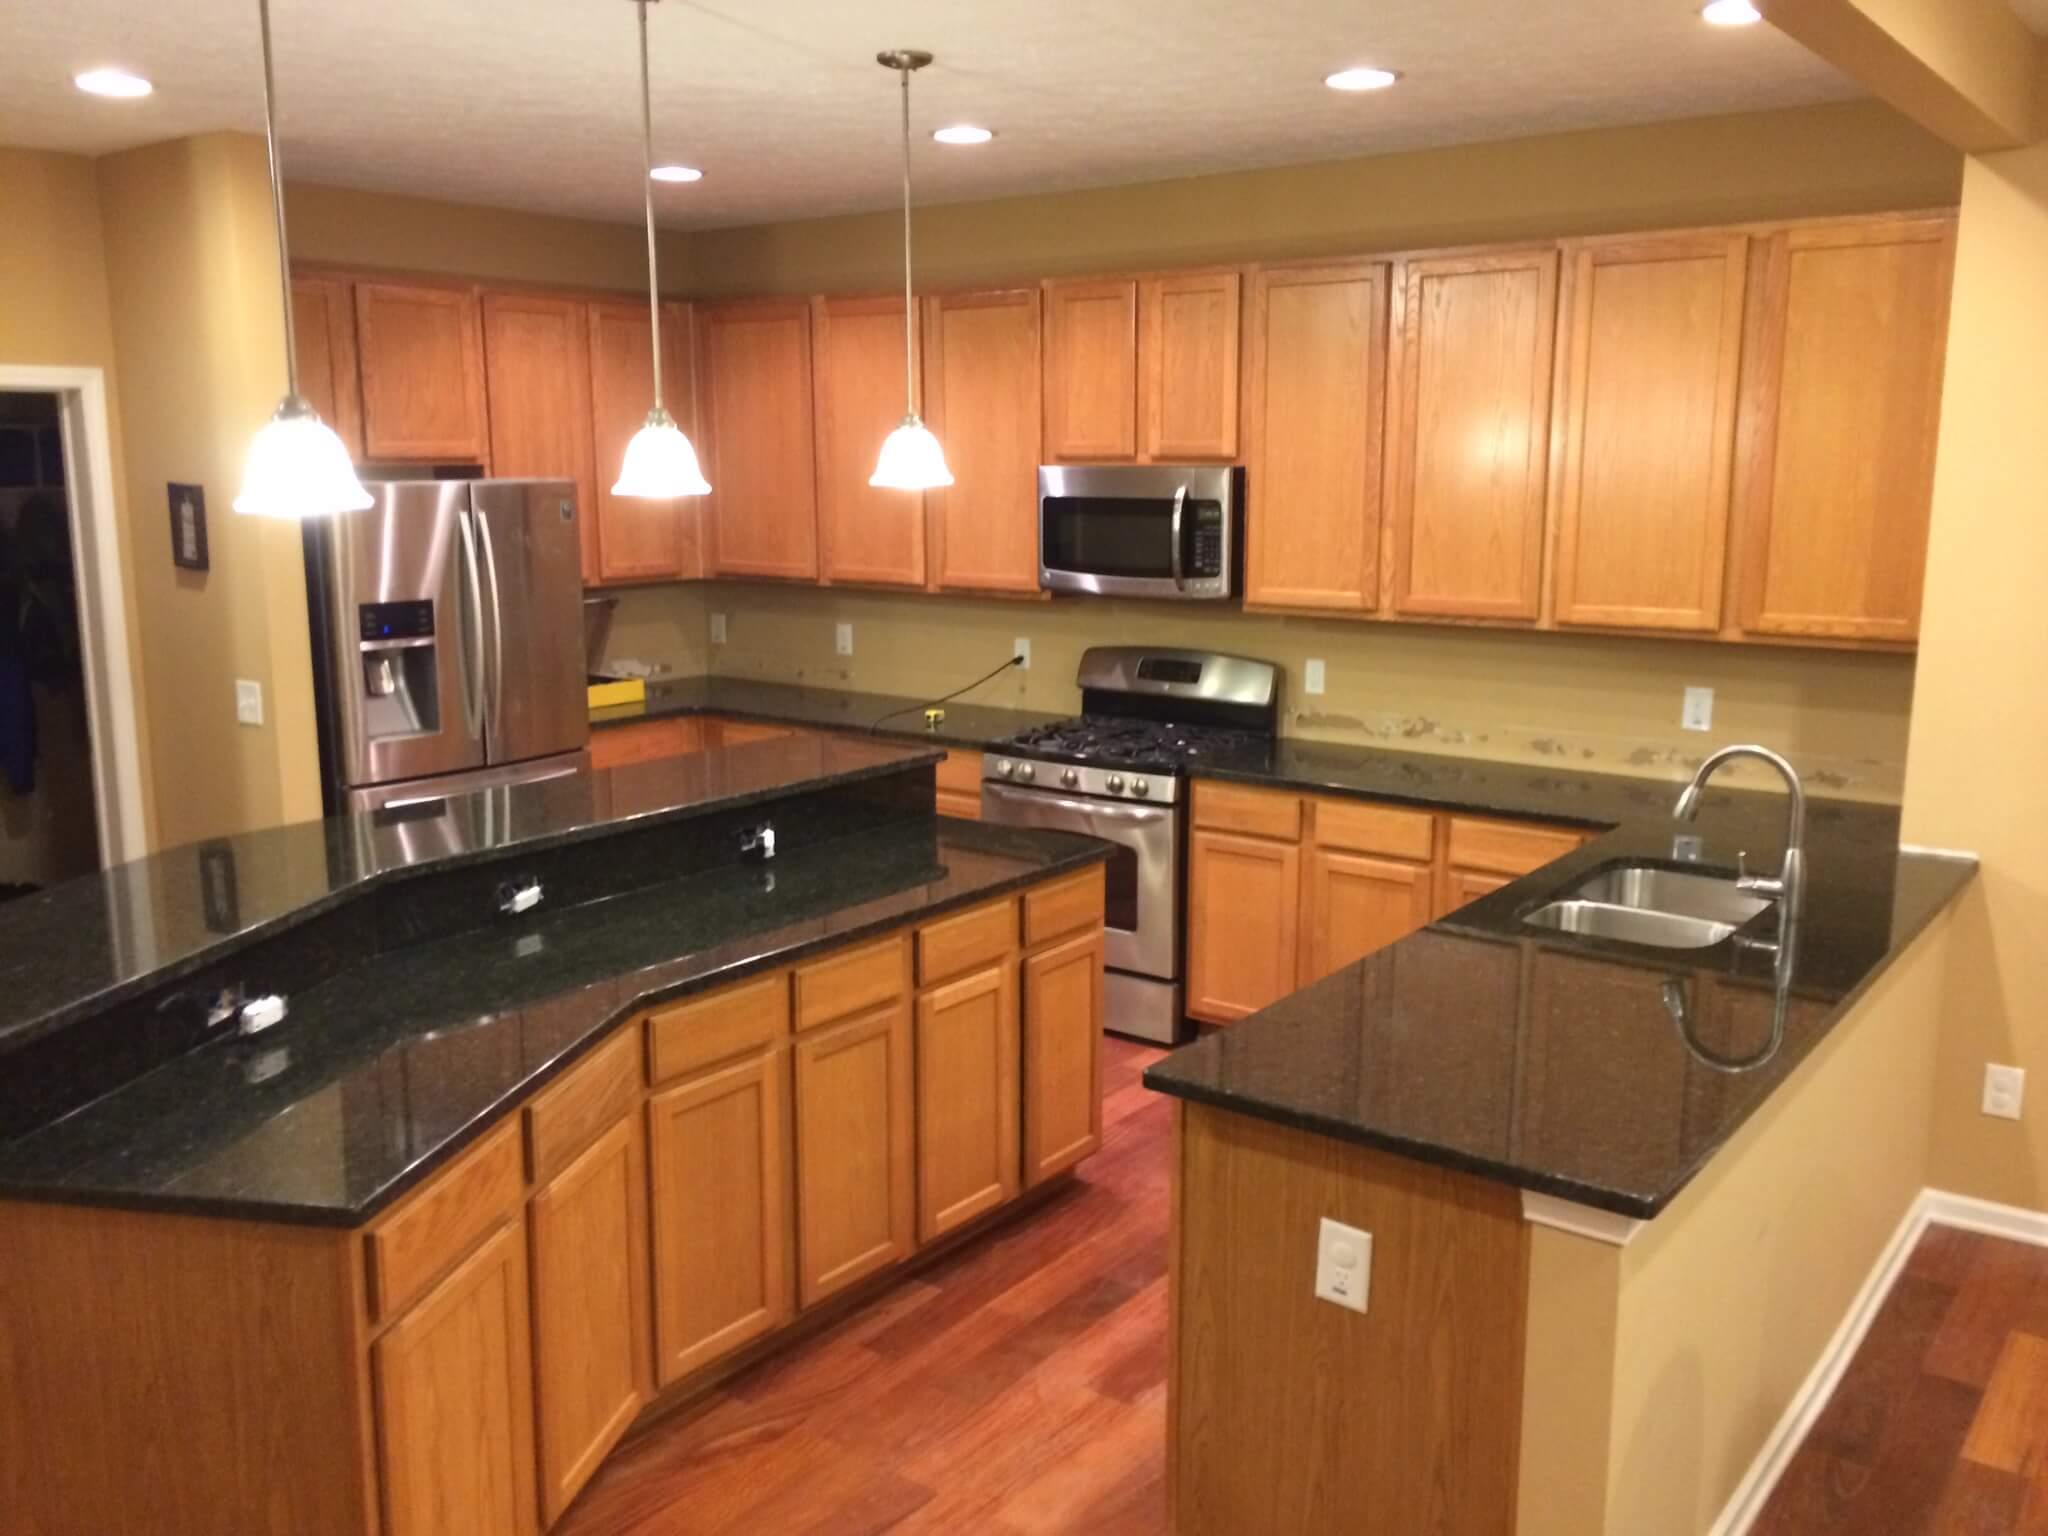 Kitchen Granite Countertops - City Granite Countertops ... on Modern:0Bjn4Cem9Be= Kitchen Counter  id=70902